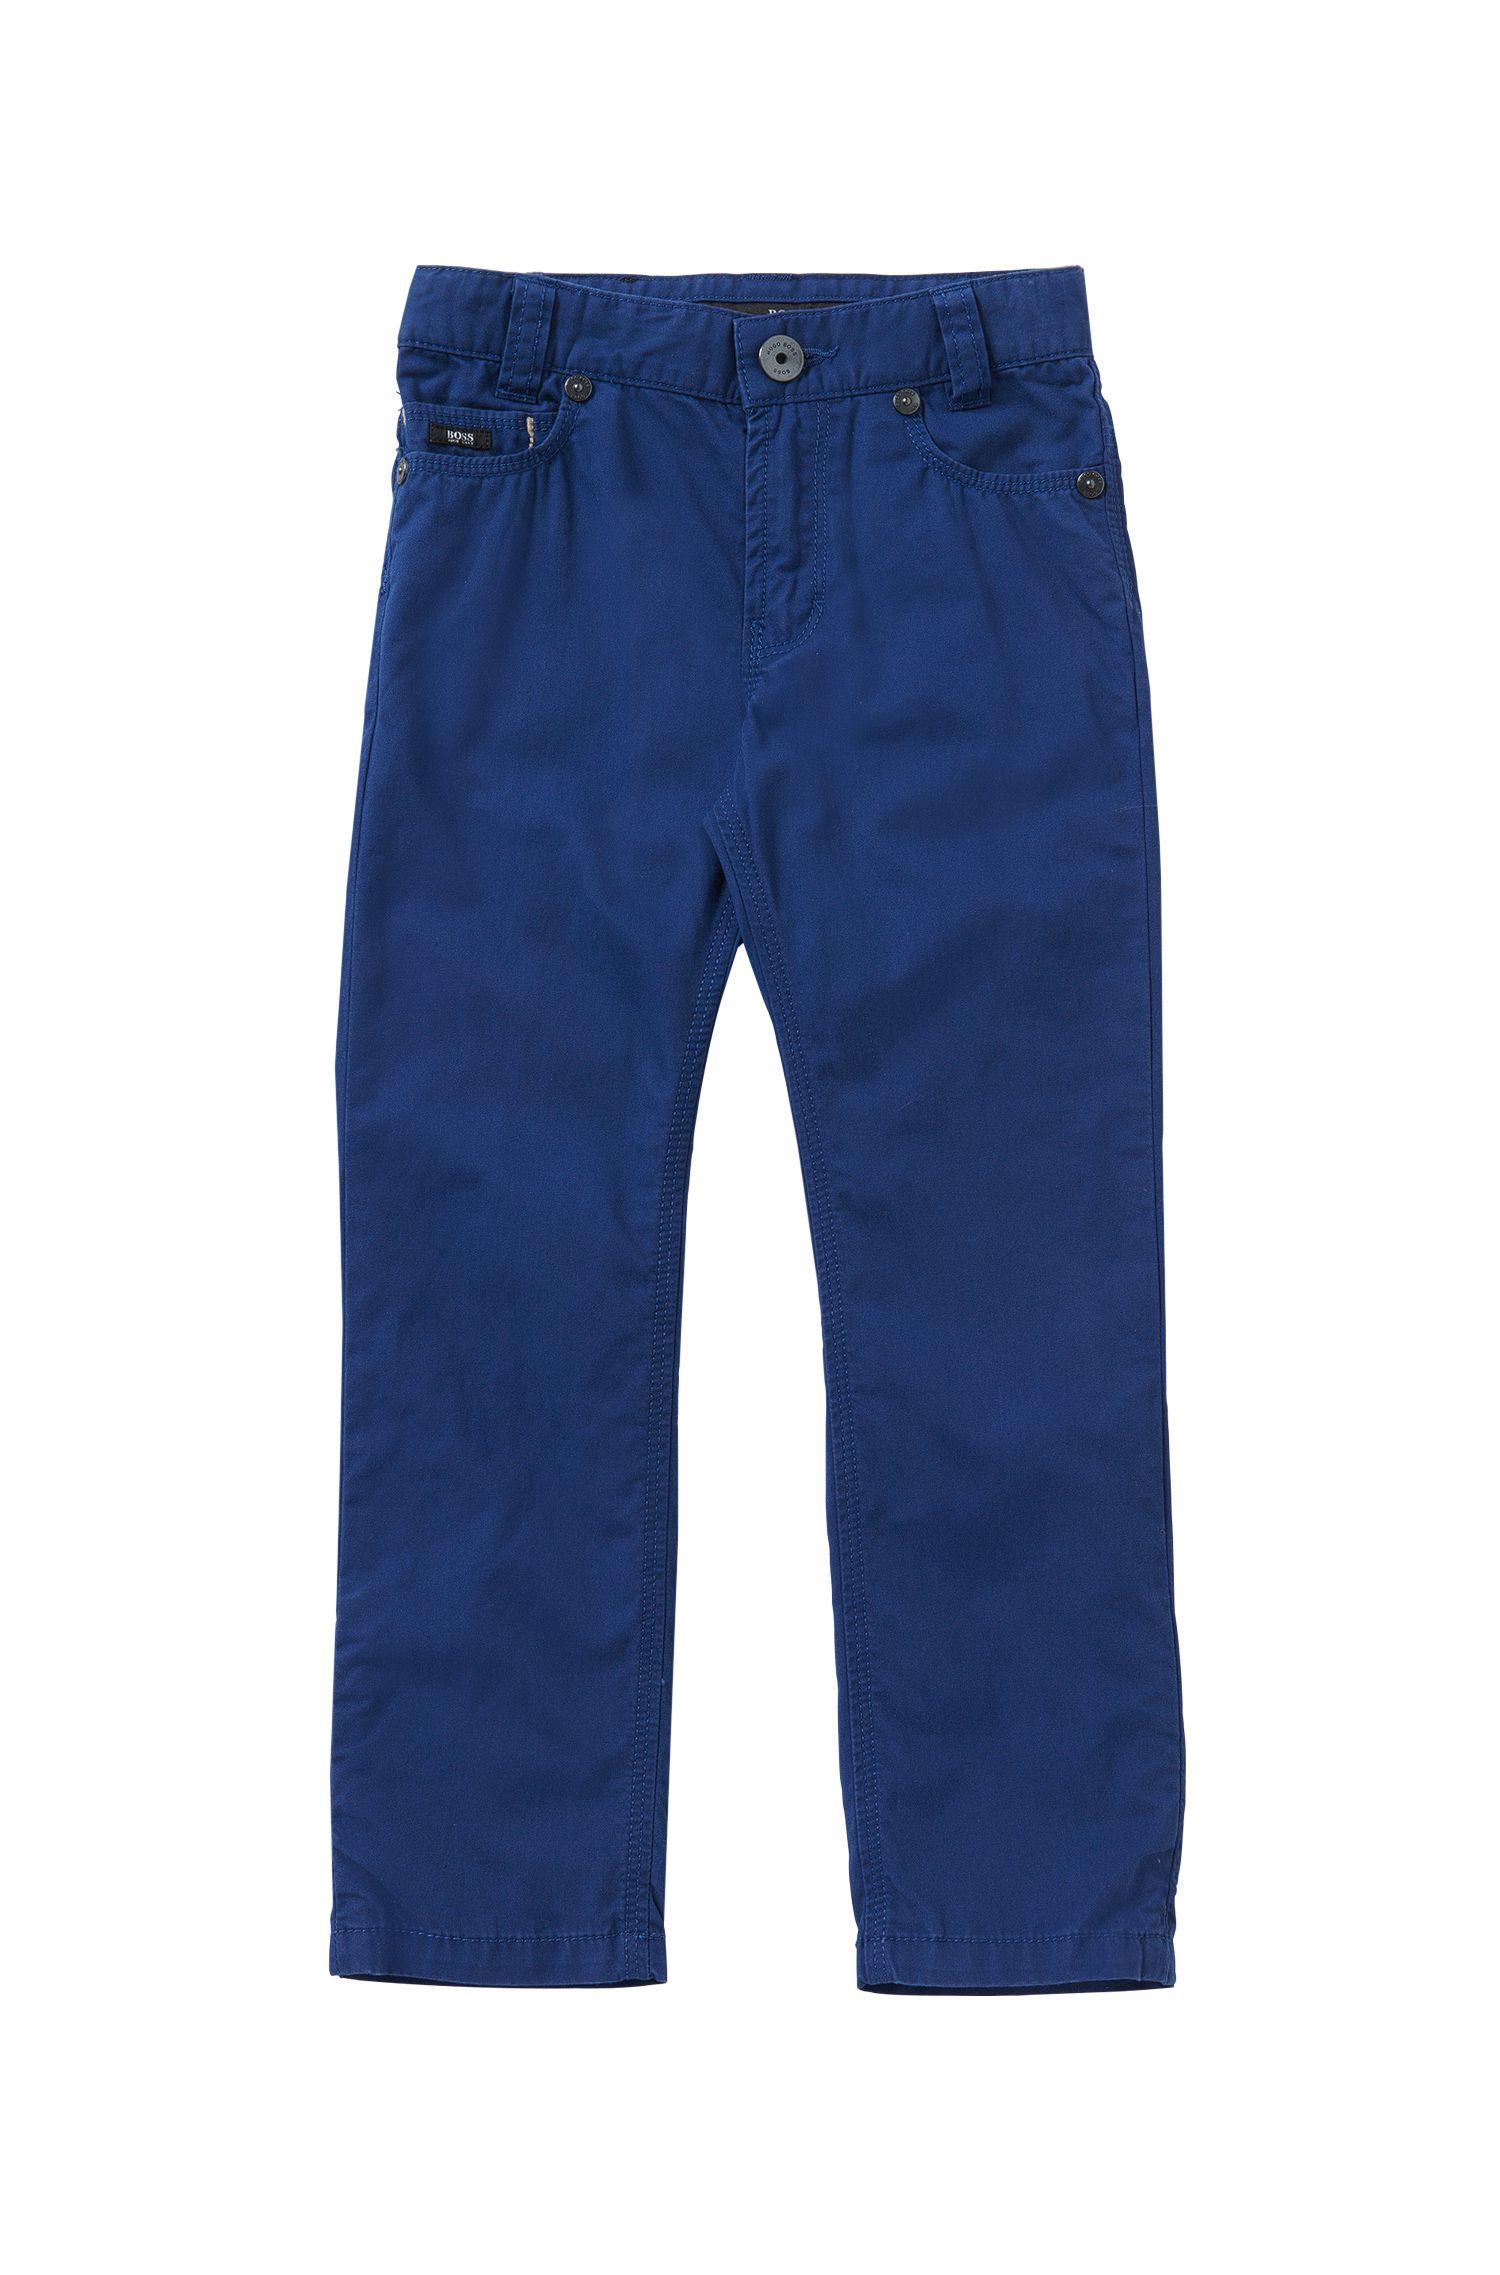 Plain-coloured slim-fit kids' trousers in cotton: 'J24393'